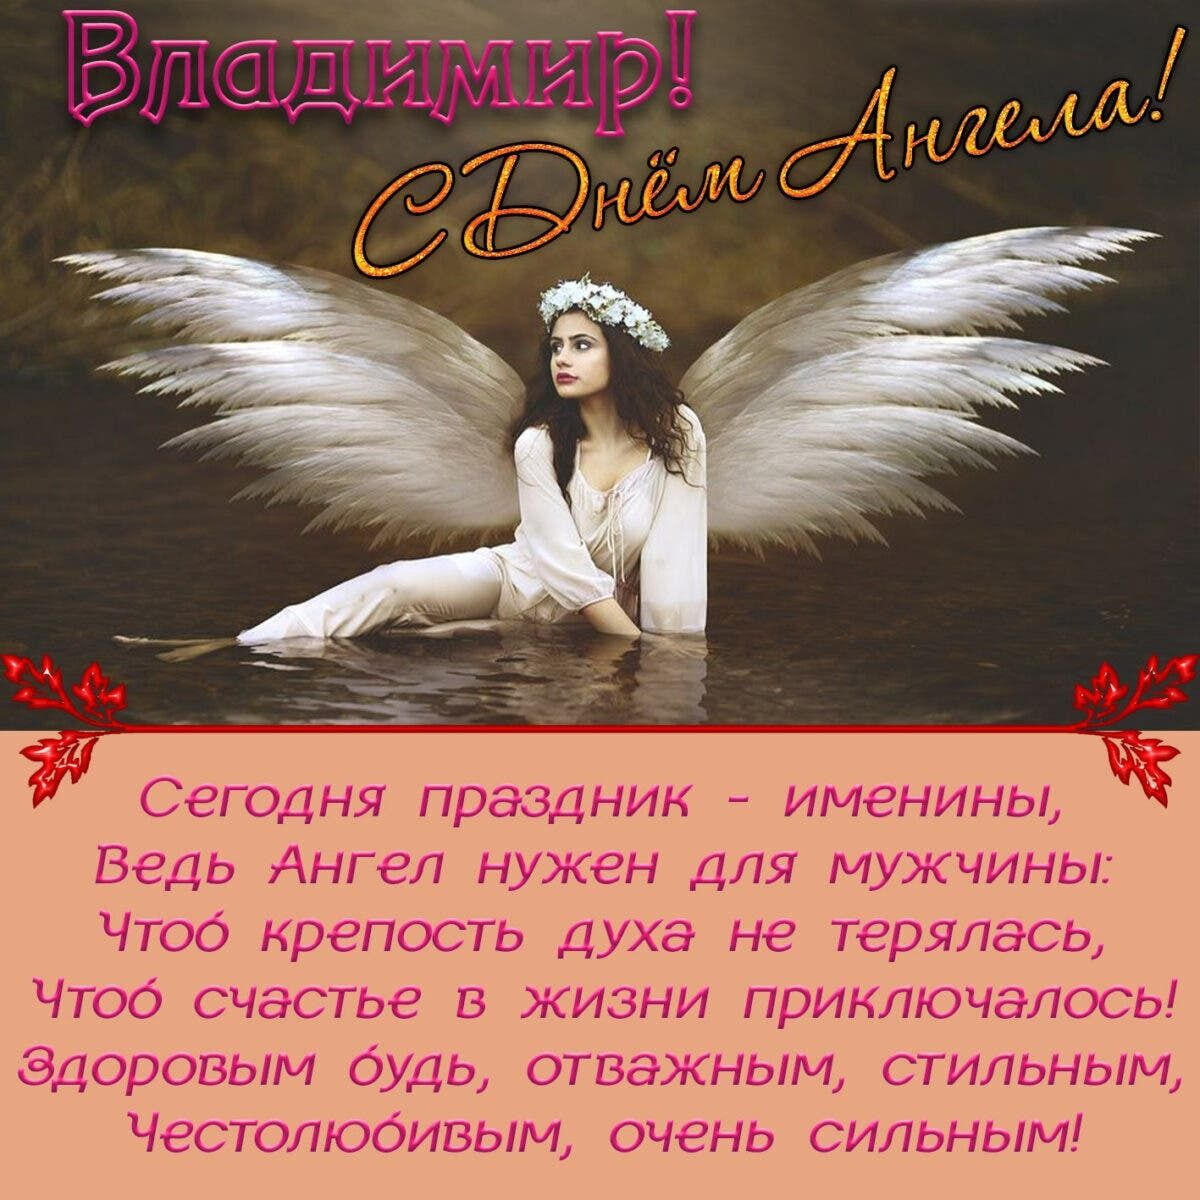 Картинка ко дню ангела Владимира